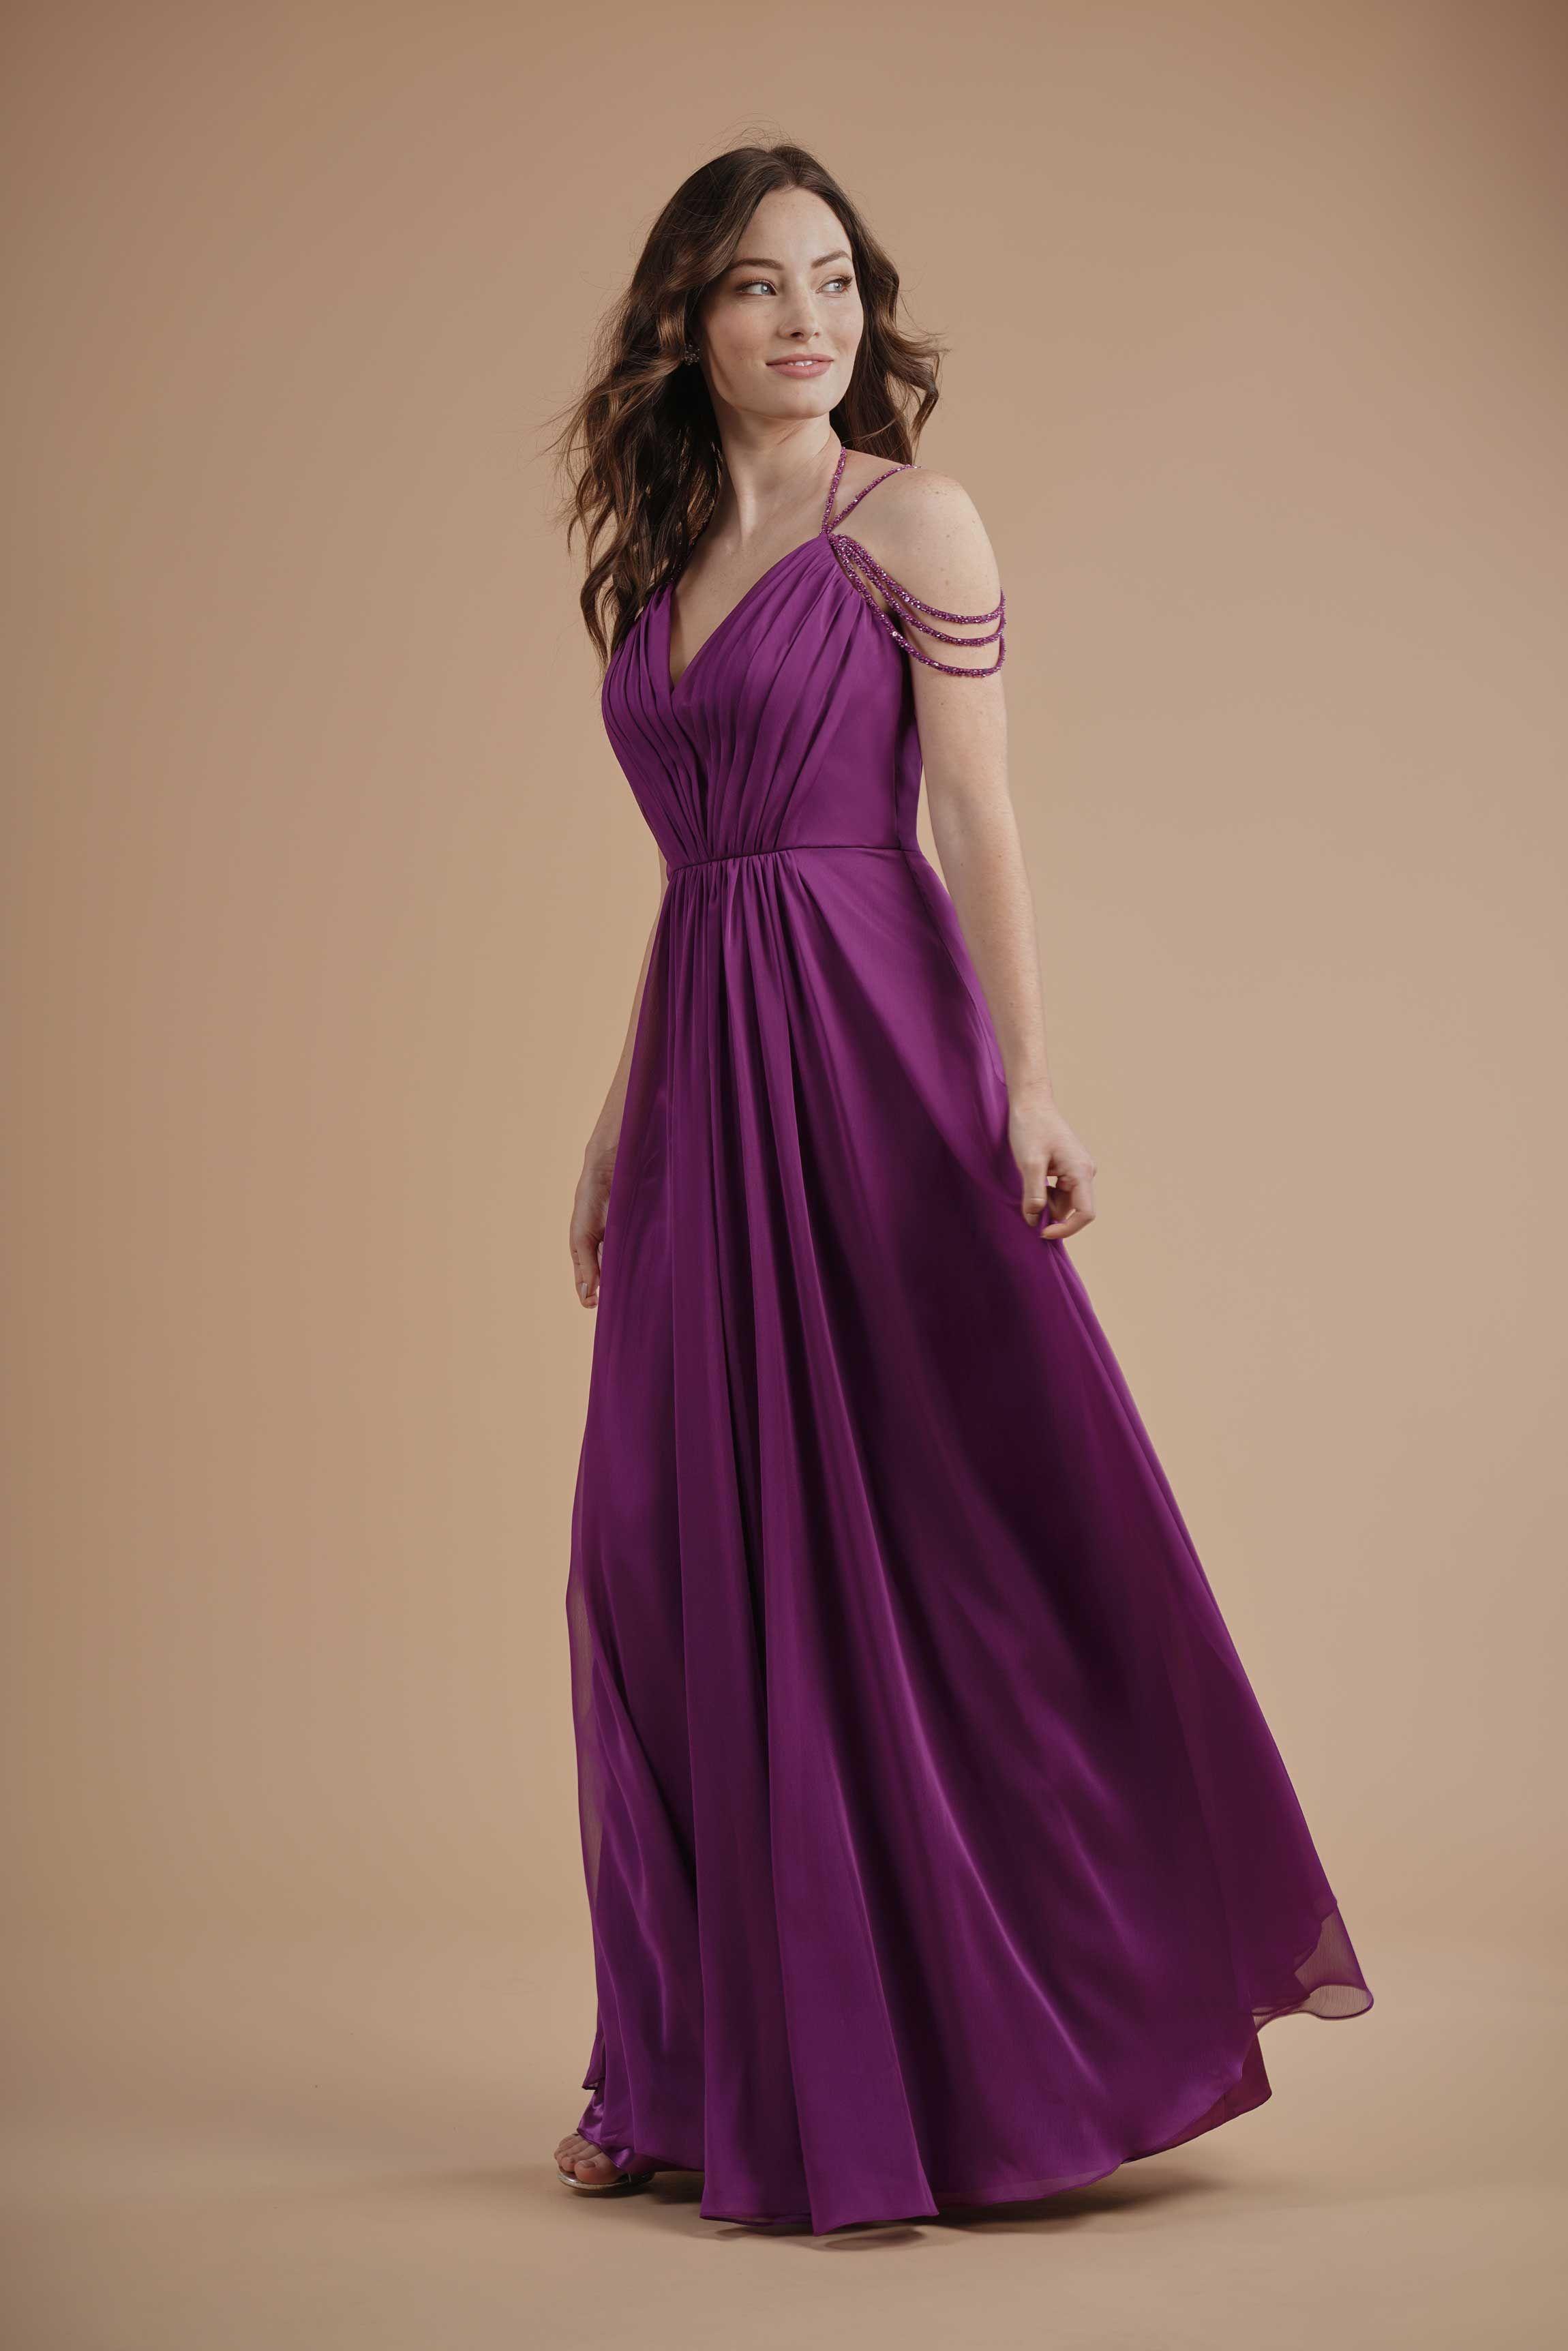 Abendmode Jasmine Abendkleid L214003 Event Kleider Brautjungfernkleid Abendkleid